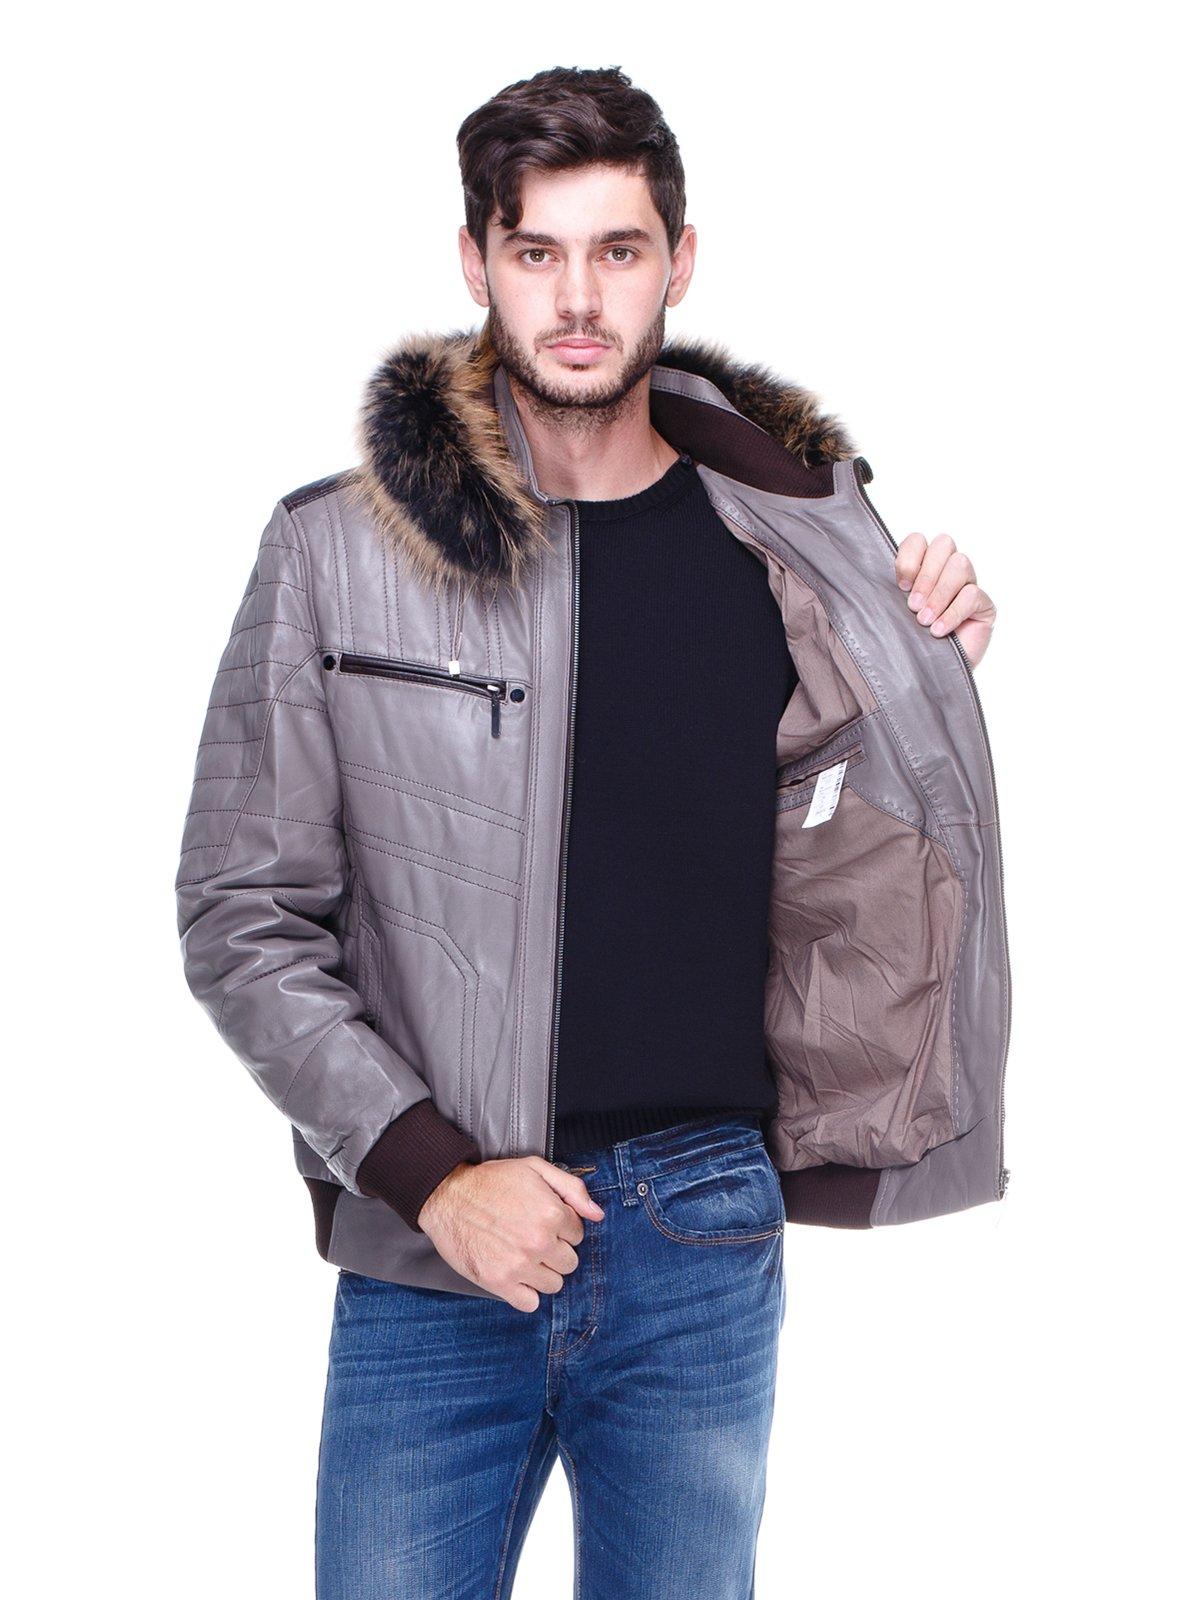 Куртка сіра з оздобленим хутром капюшоном   1830355   фото 5